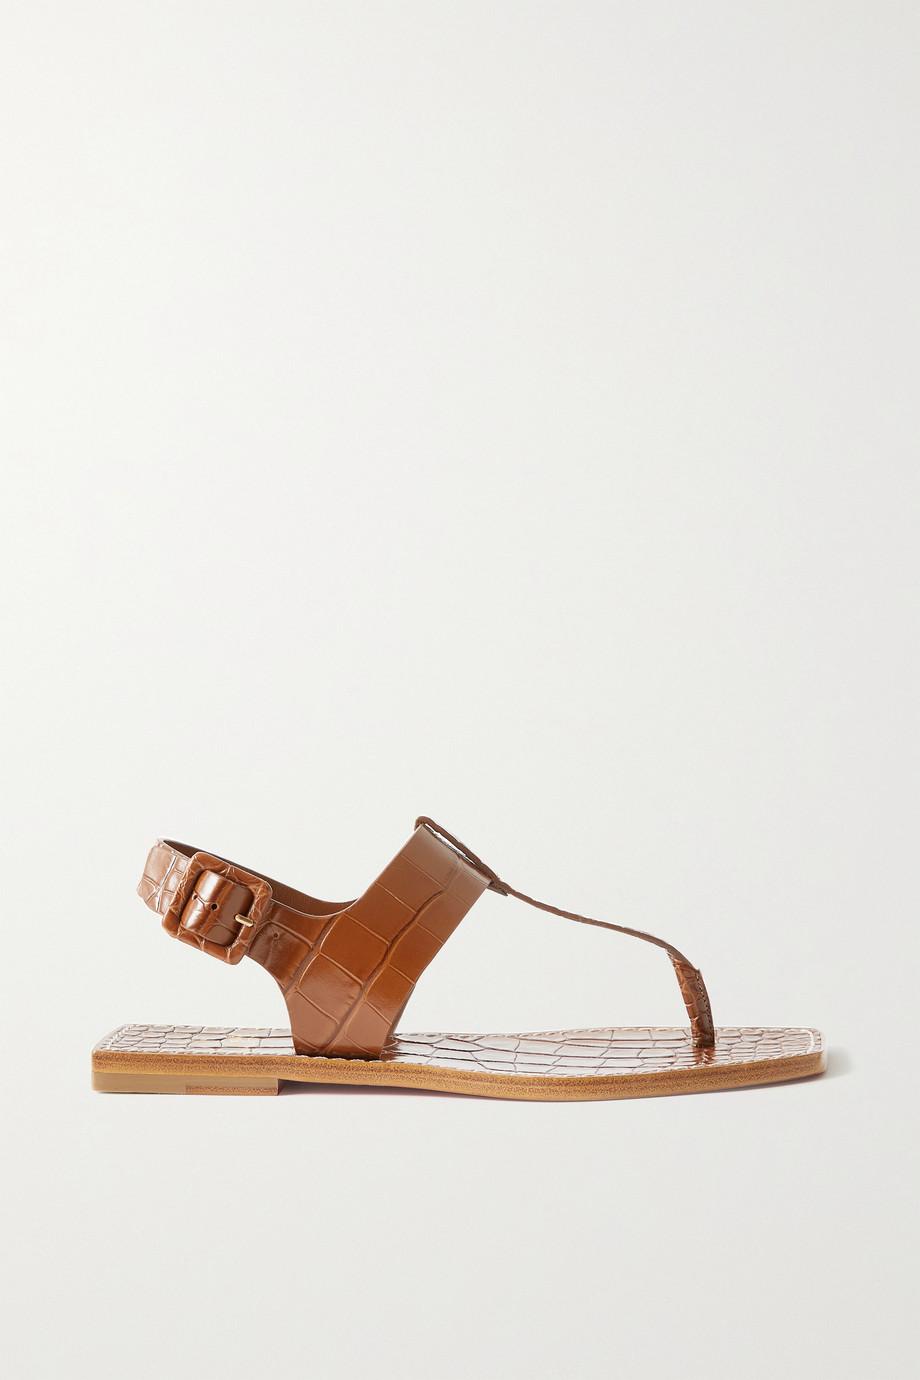 Christian Louboutin Cubongo croc-effect leather slingback sandals